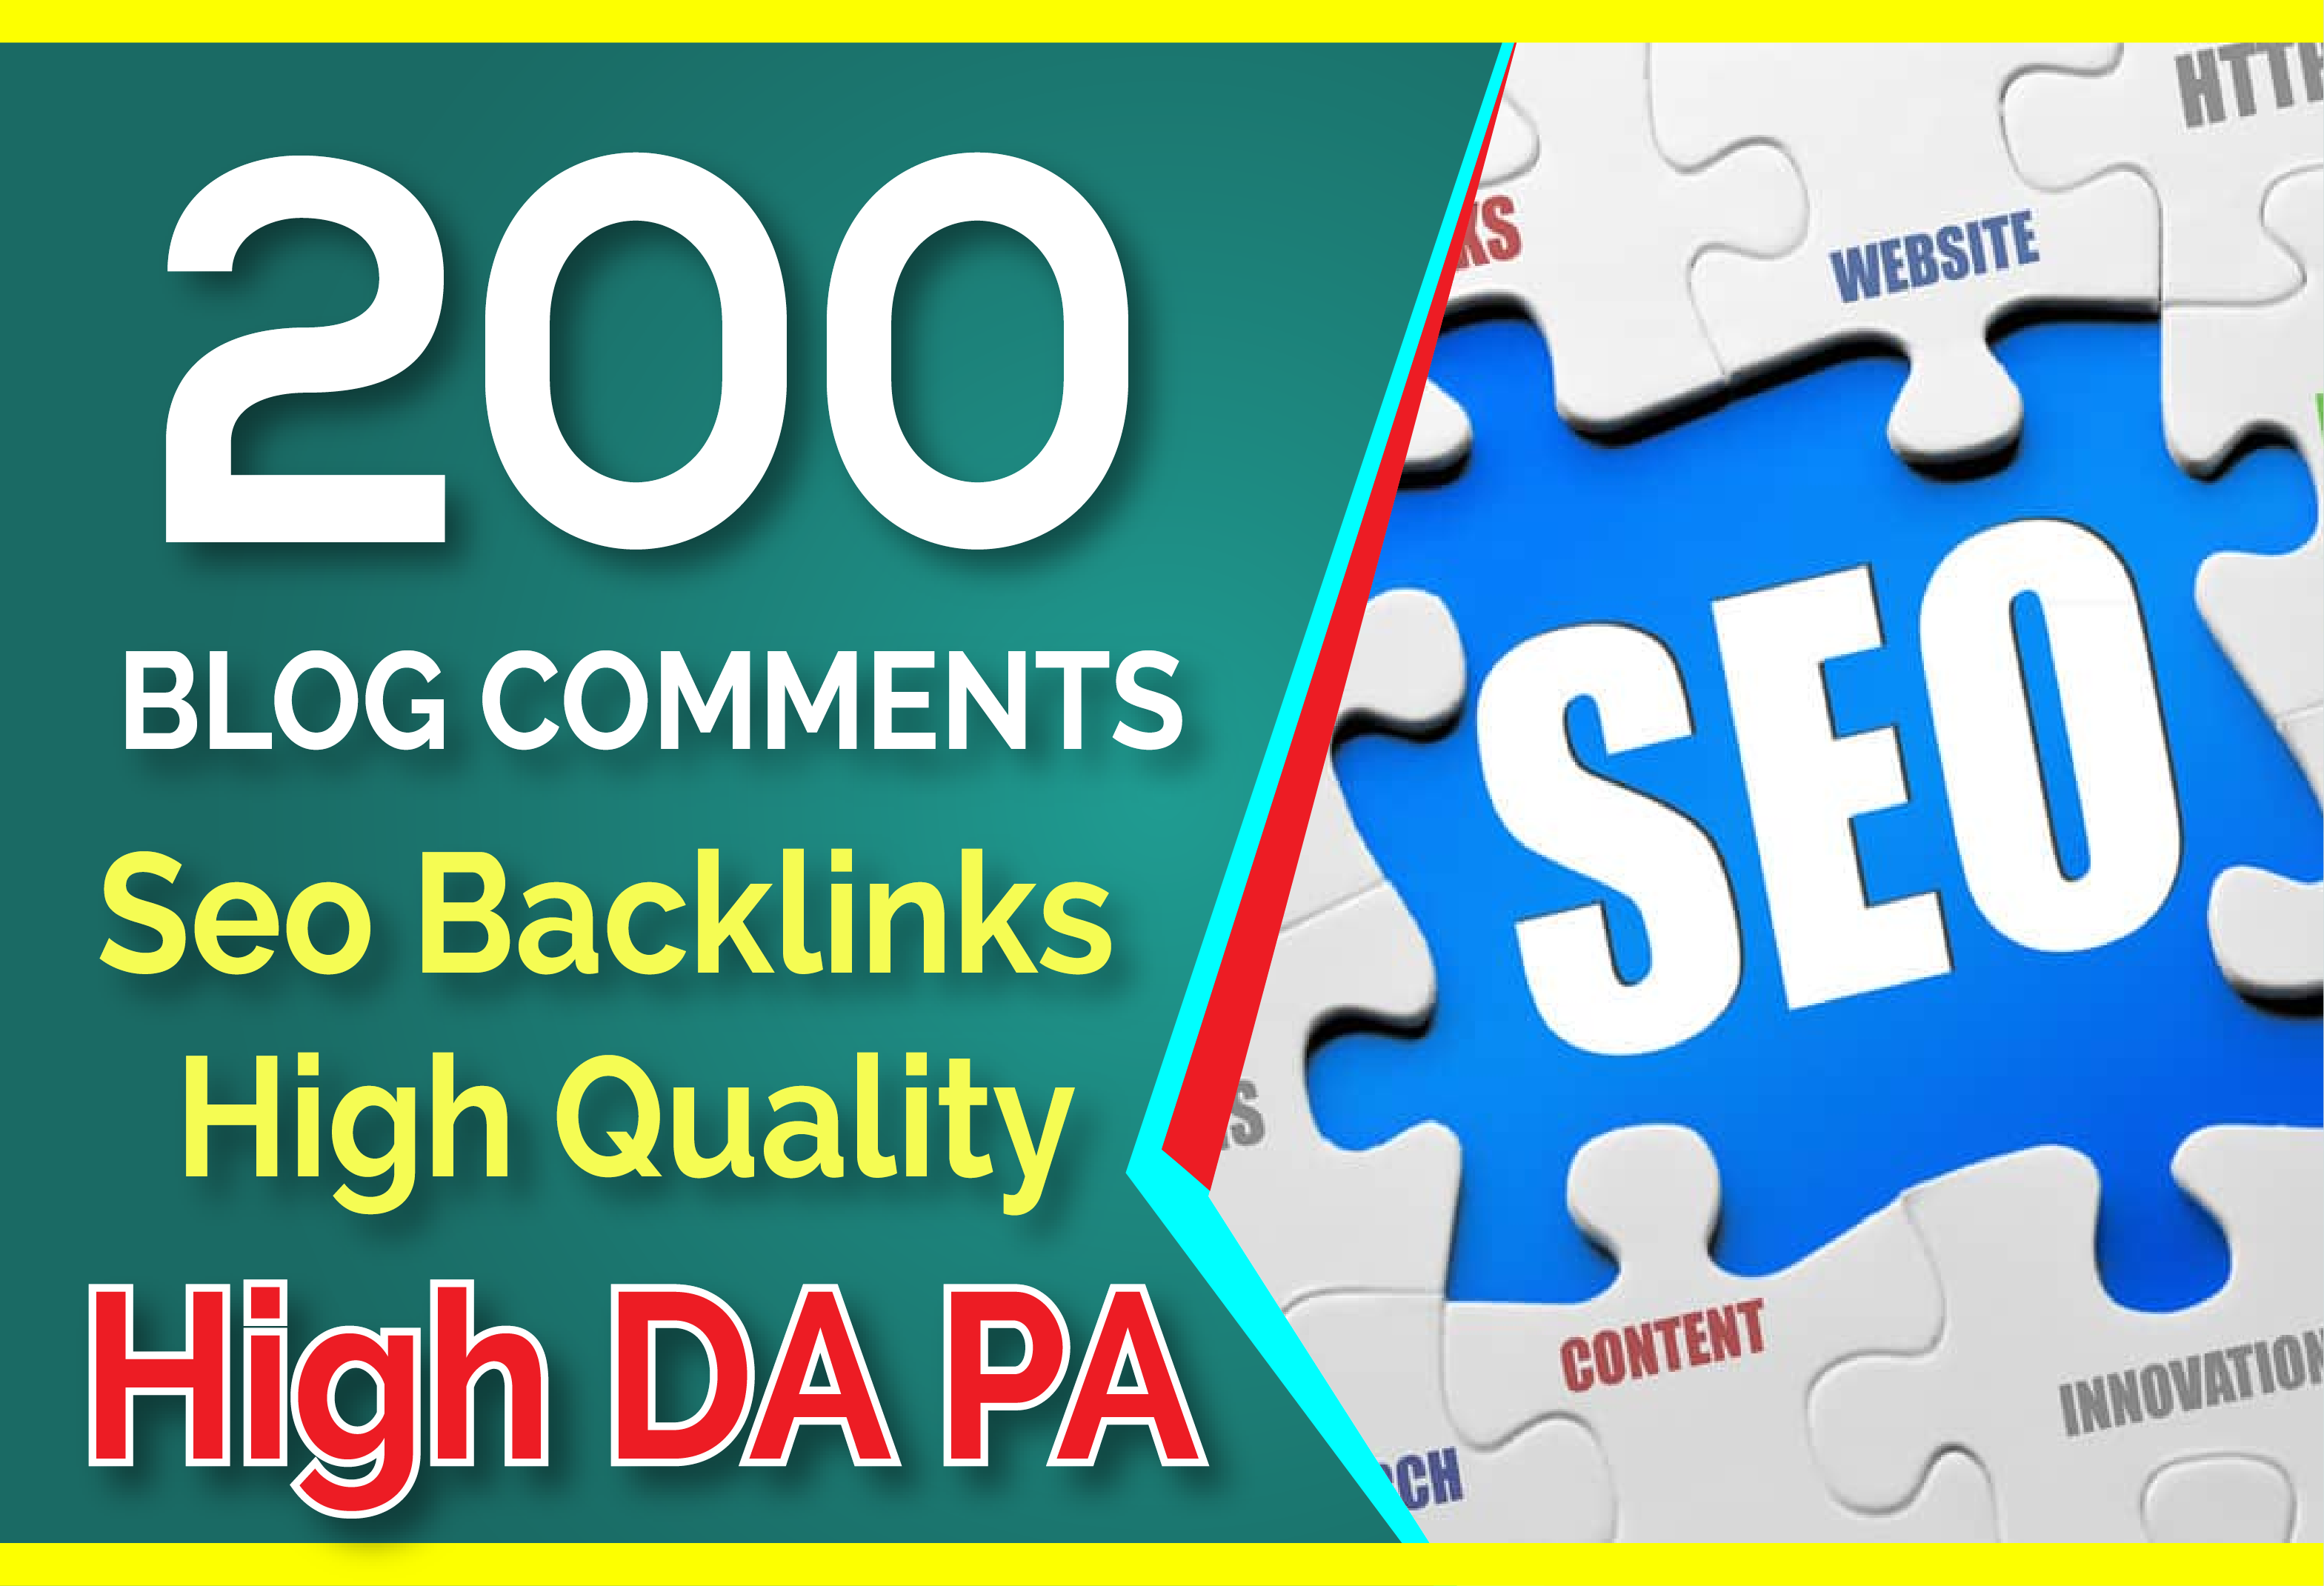 do 200 blog comments seo backlinks on high da pa